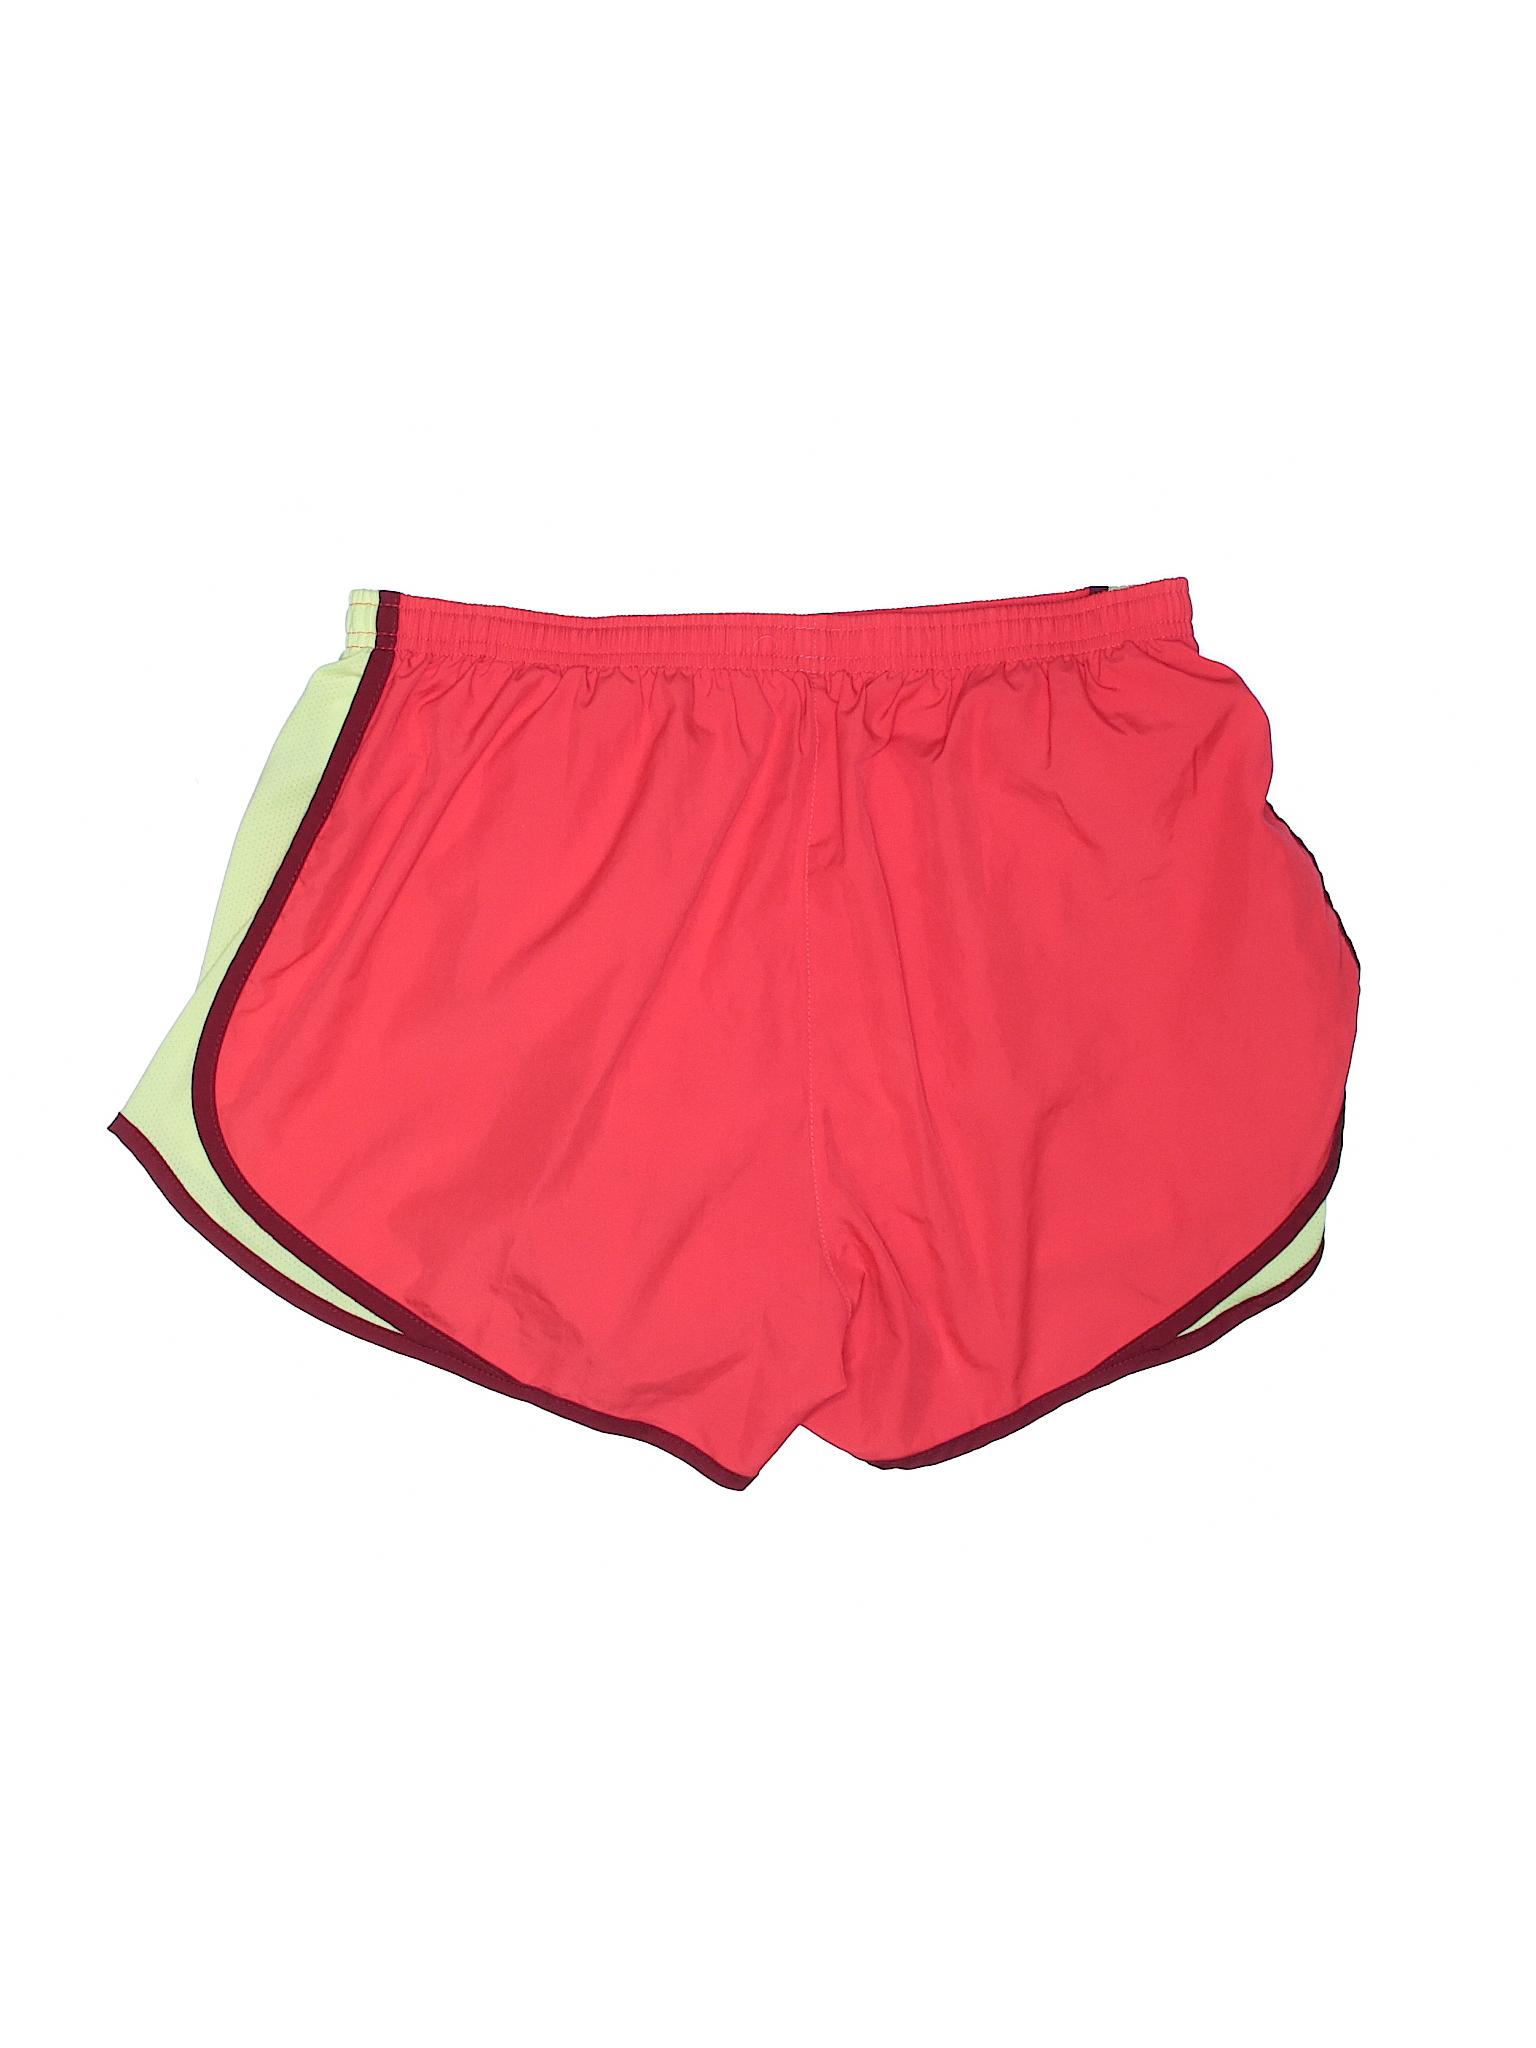 Shorts Athletic Leisure Nike Leisure winter winter z7YR7X